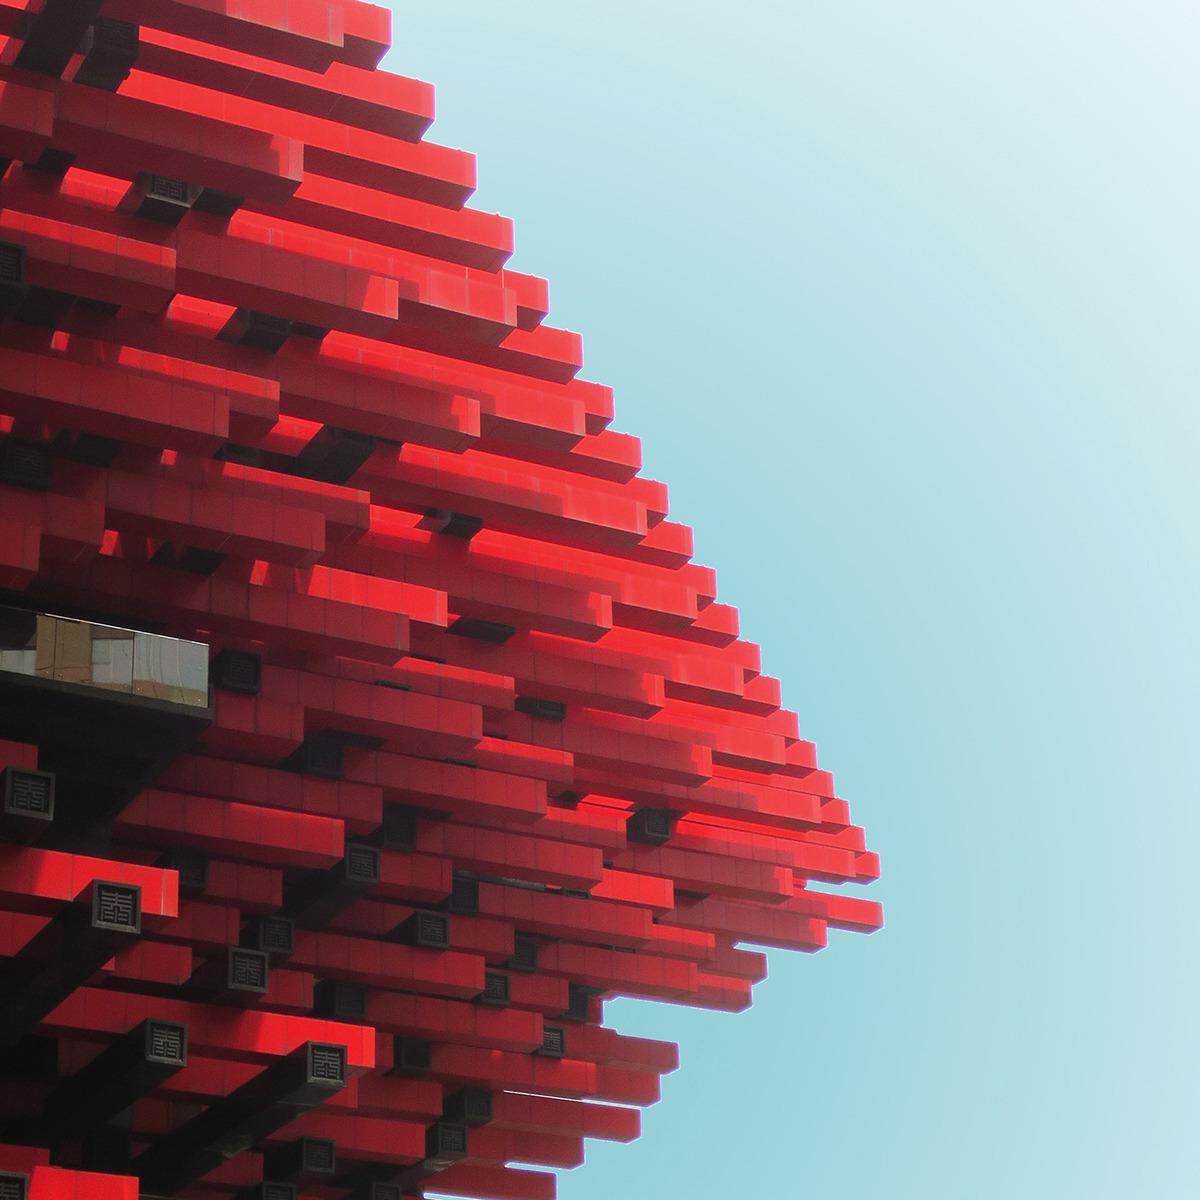 Architectural Blues Kris Provoo - palank | ello